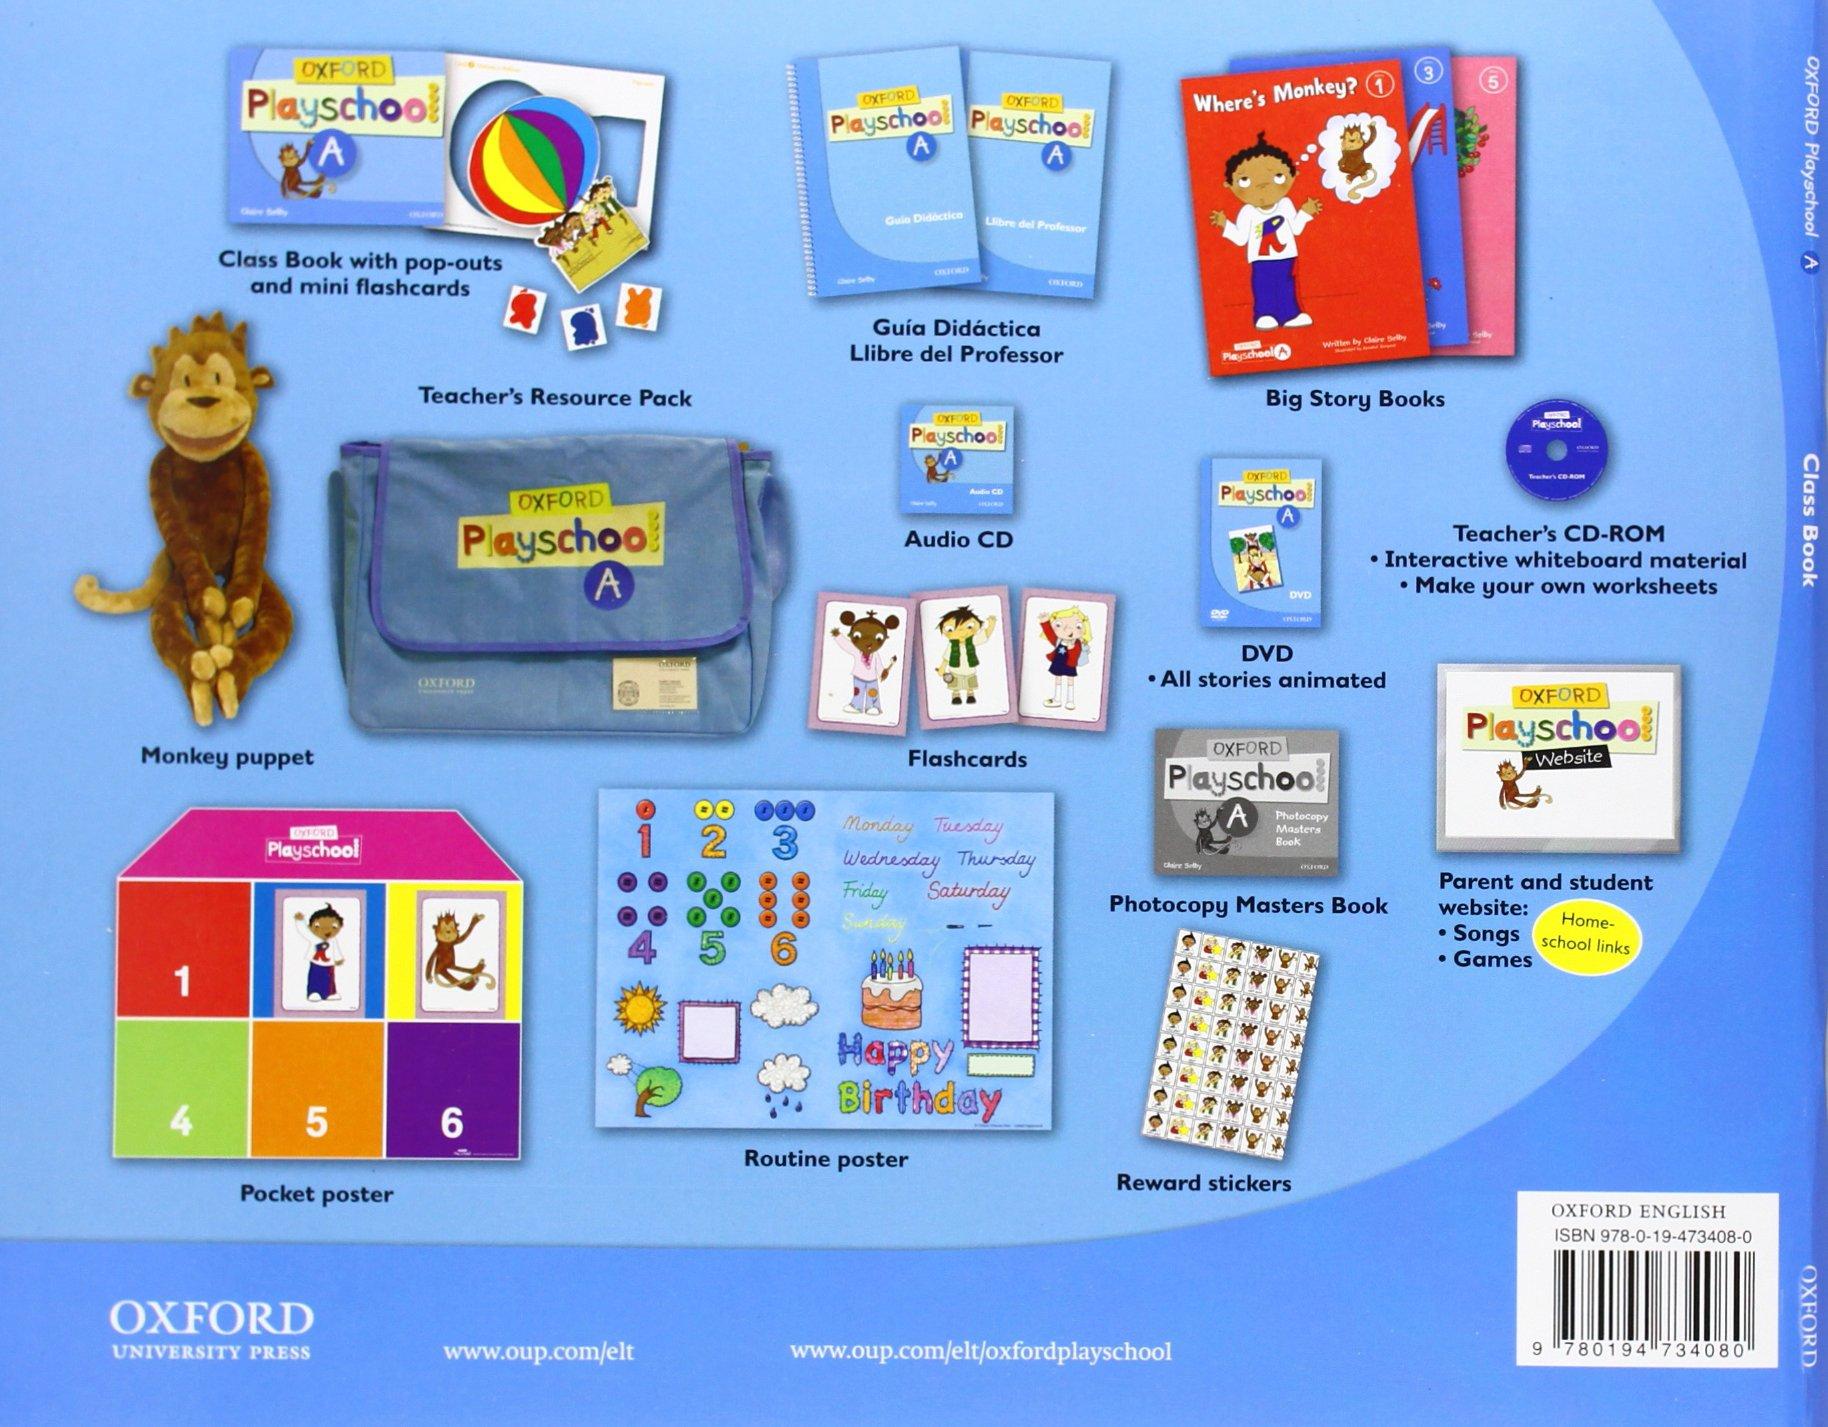 Oxford Playschool a Class Book - 9780194734080: Amazon.es: Claire Selby:  Libros